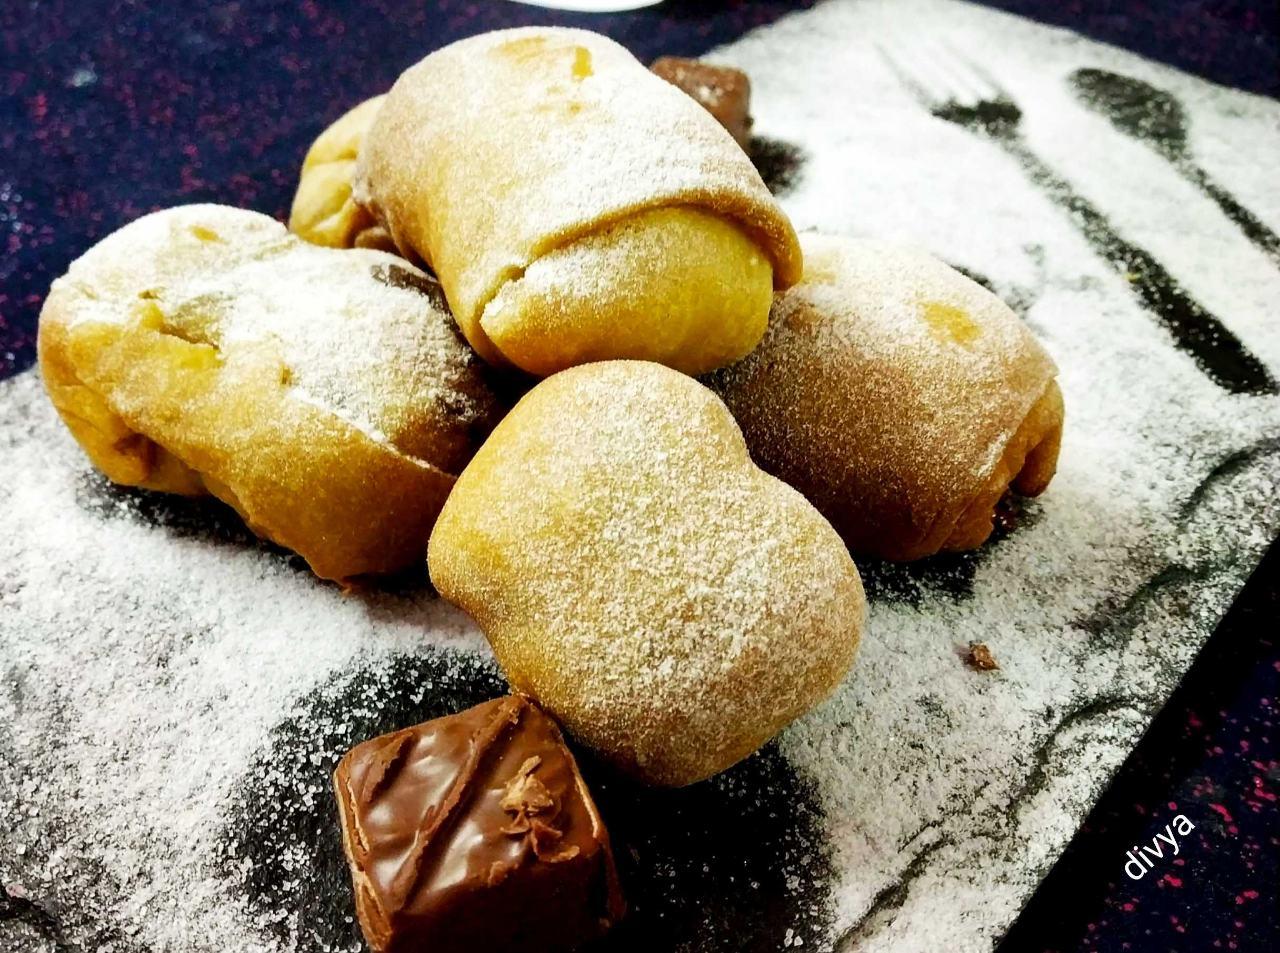 Chocolate Banana Croissants